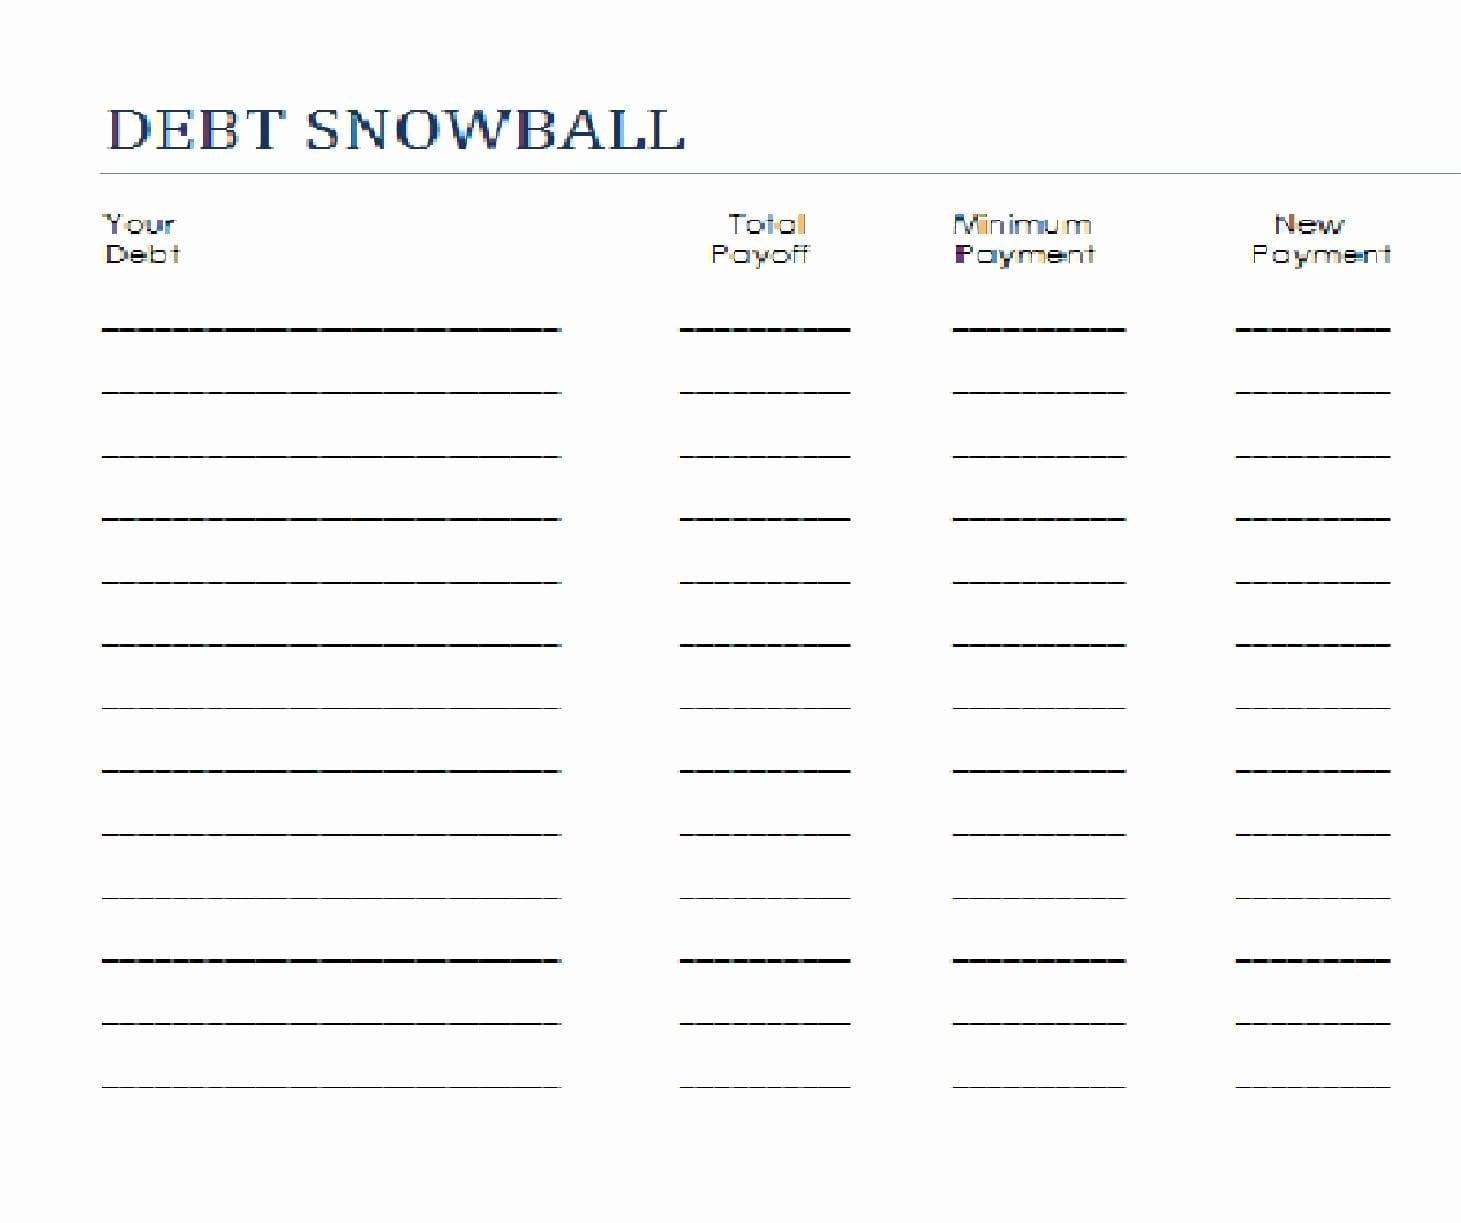 Dave Ramsey Debt Snowball Worksheets